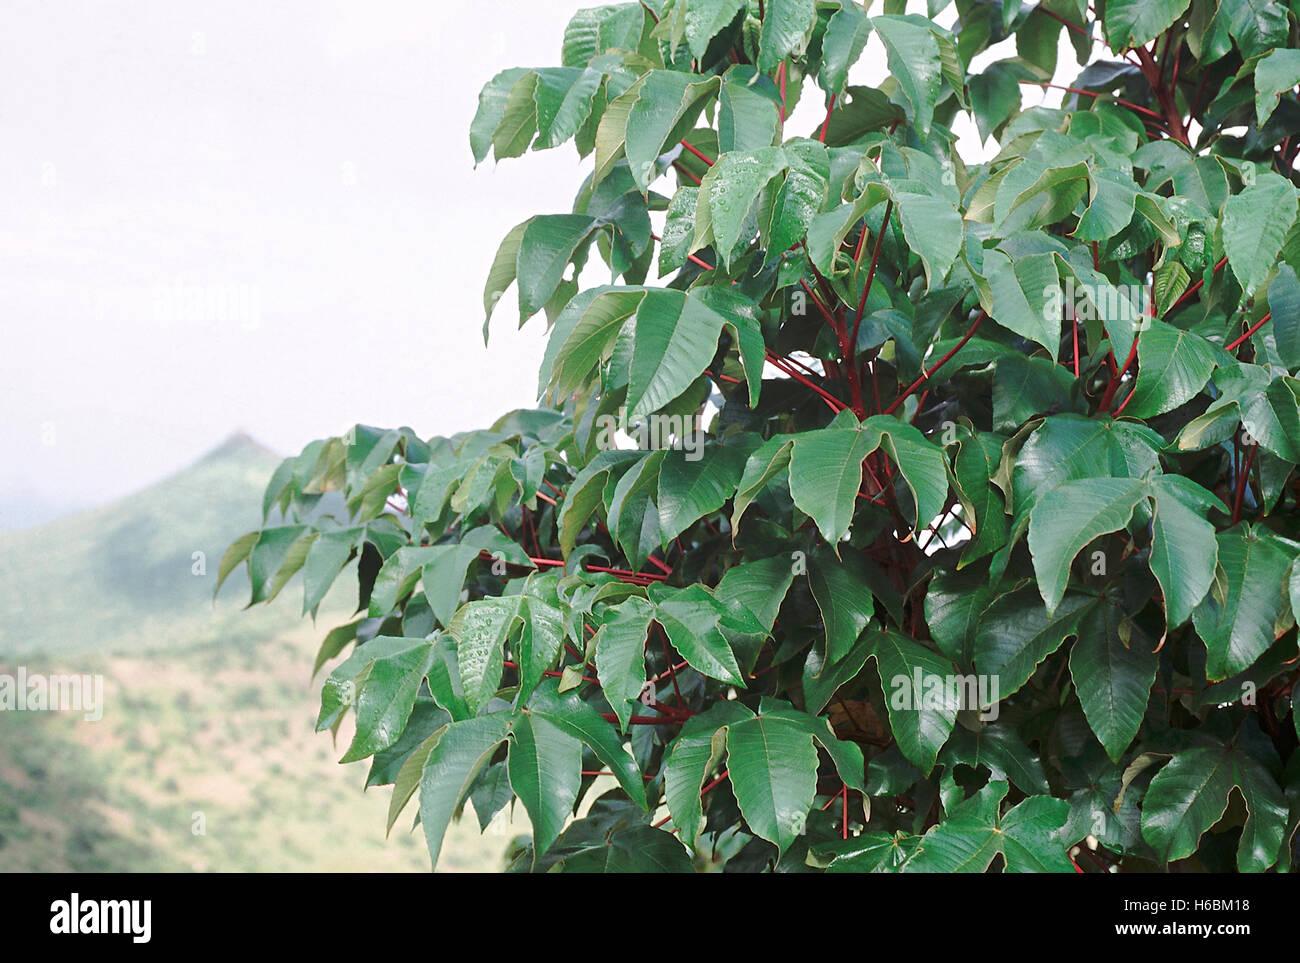 Leaves. Cochlospermum Religiosum. Yellow silk cotton tree. Family: Cochlospermaceae. Medium-sized deciduous tree - Stock Image